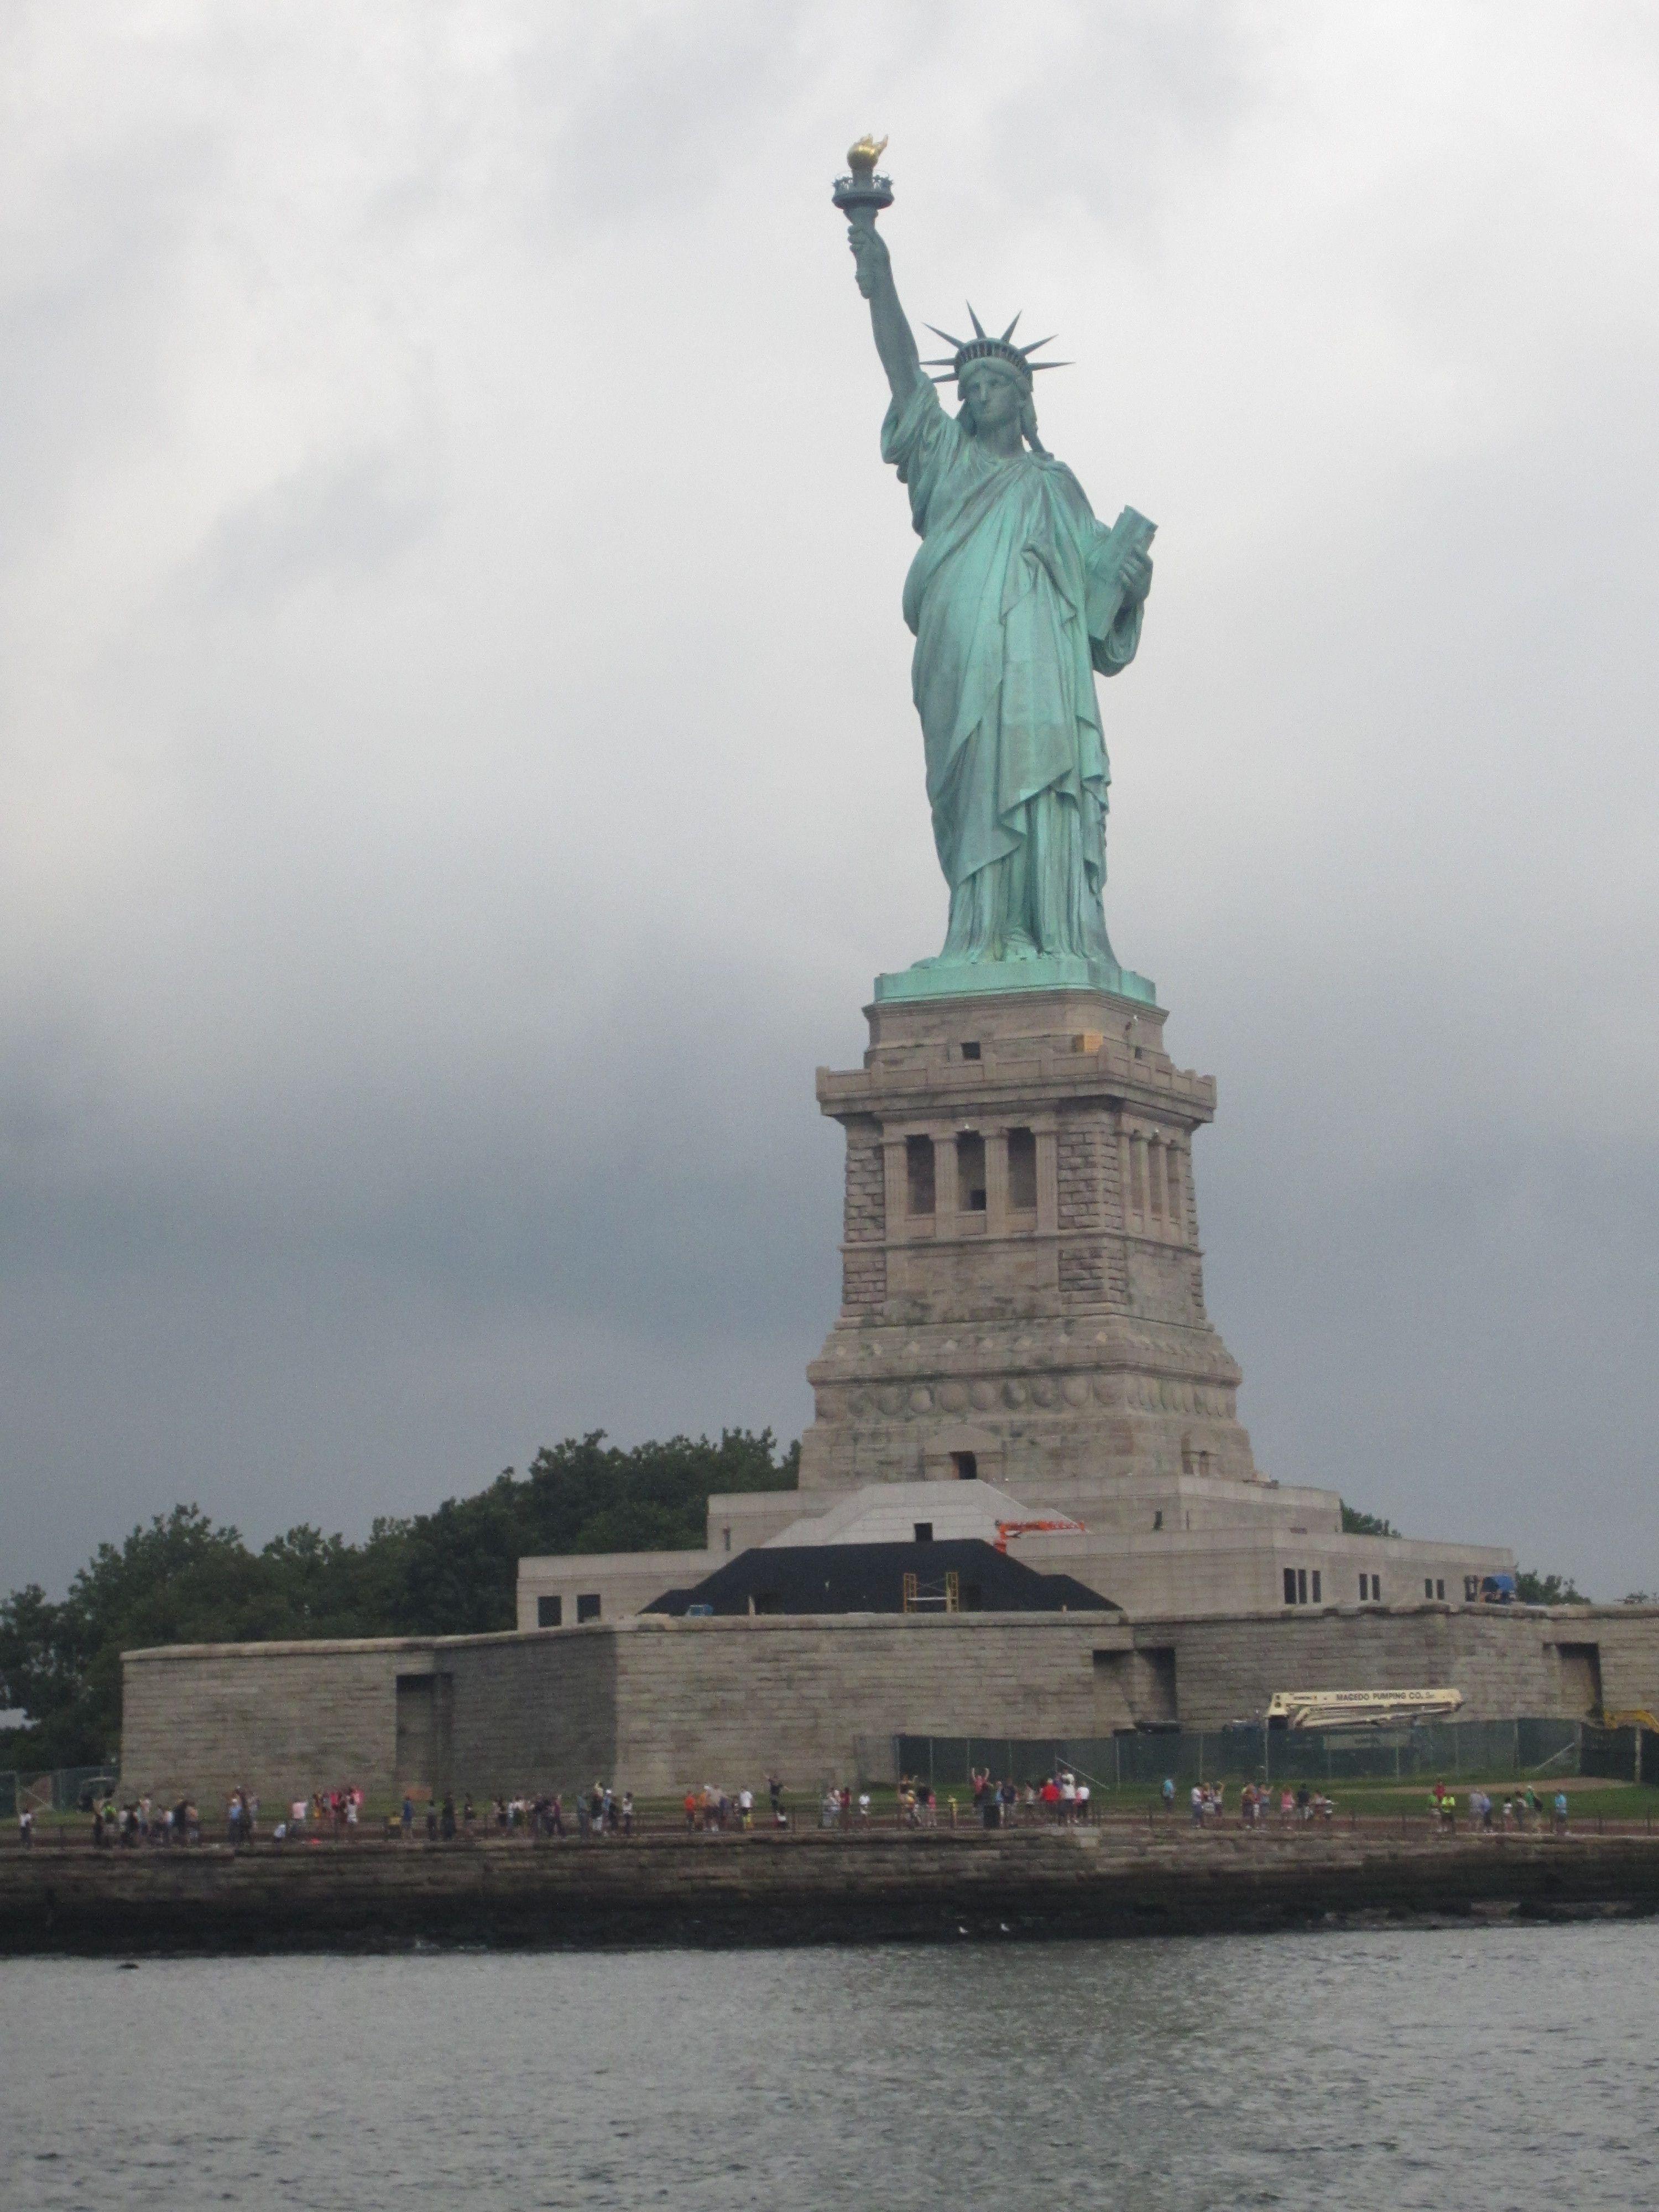 Statute of Liberty - been inside her head